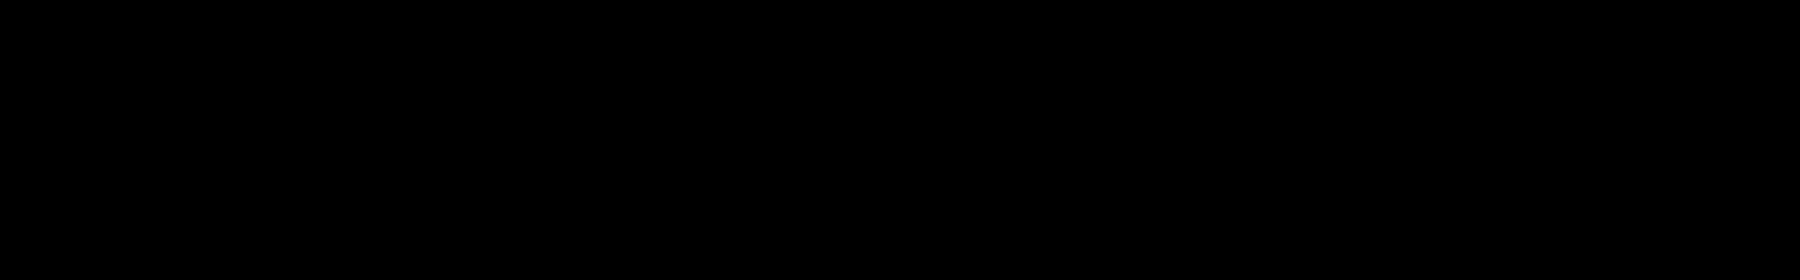 Chord Sport audio waveform